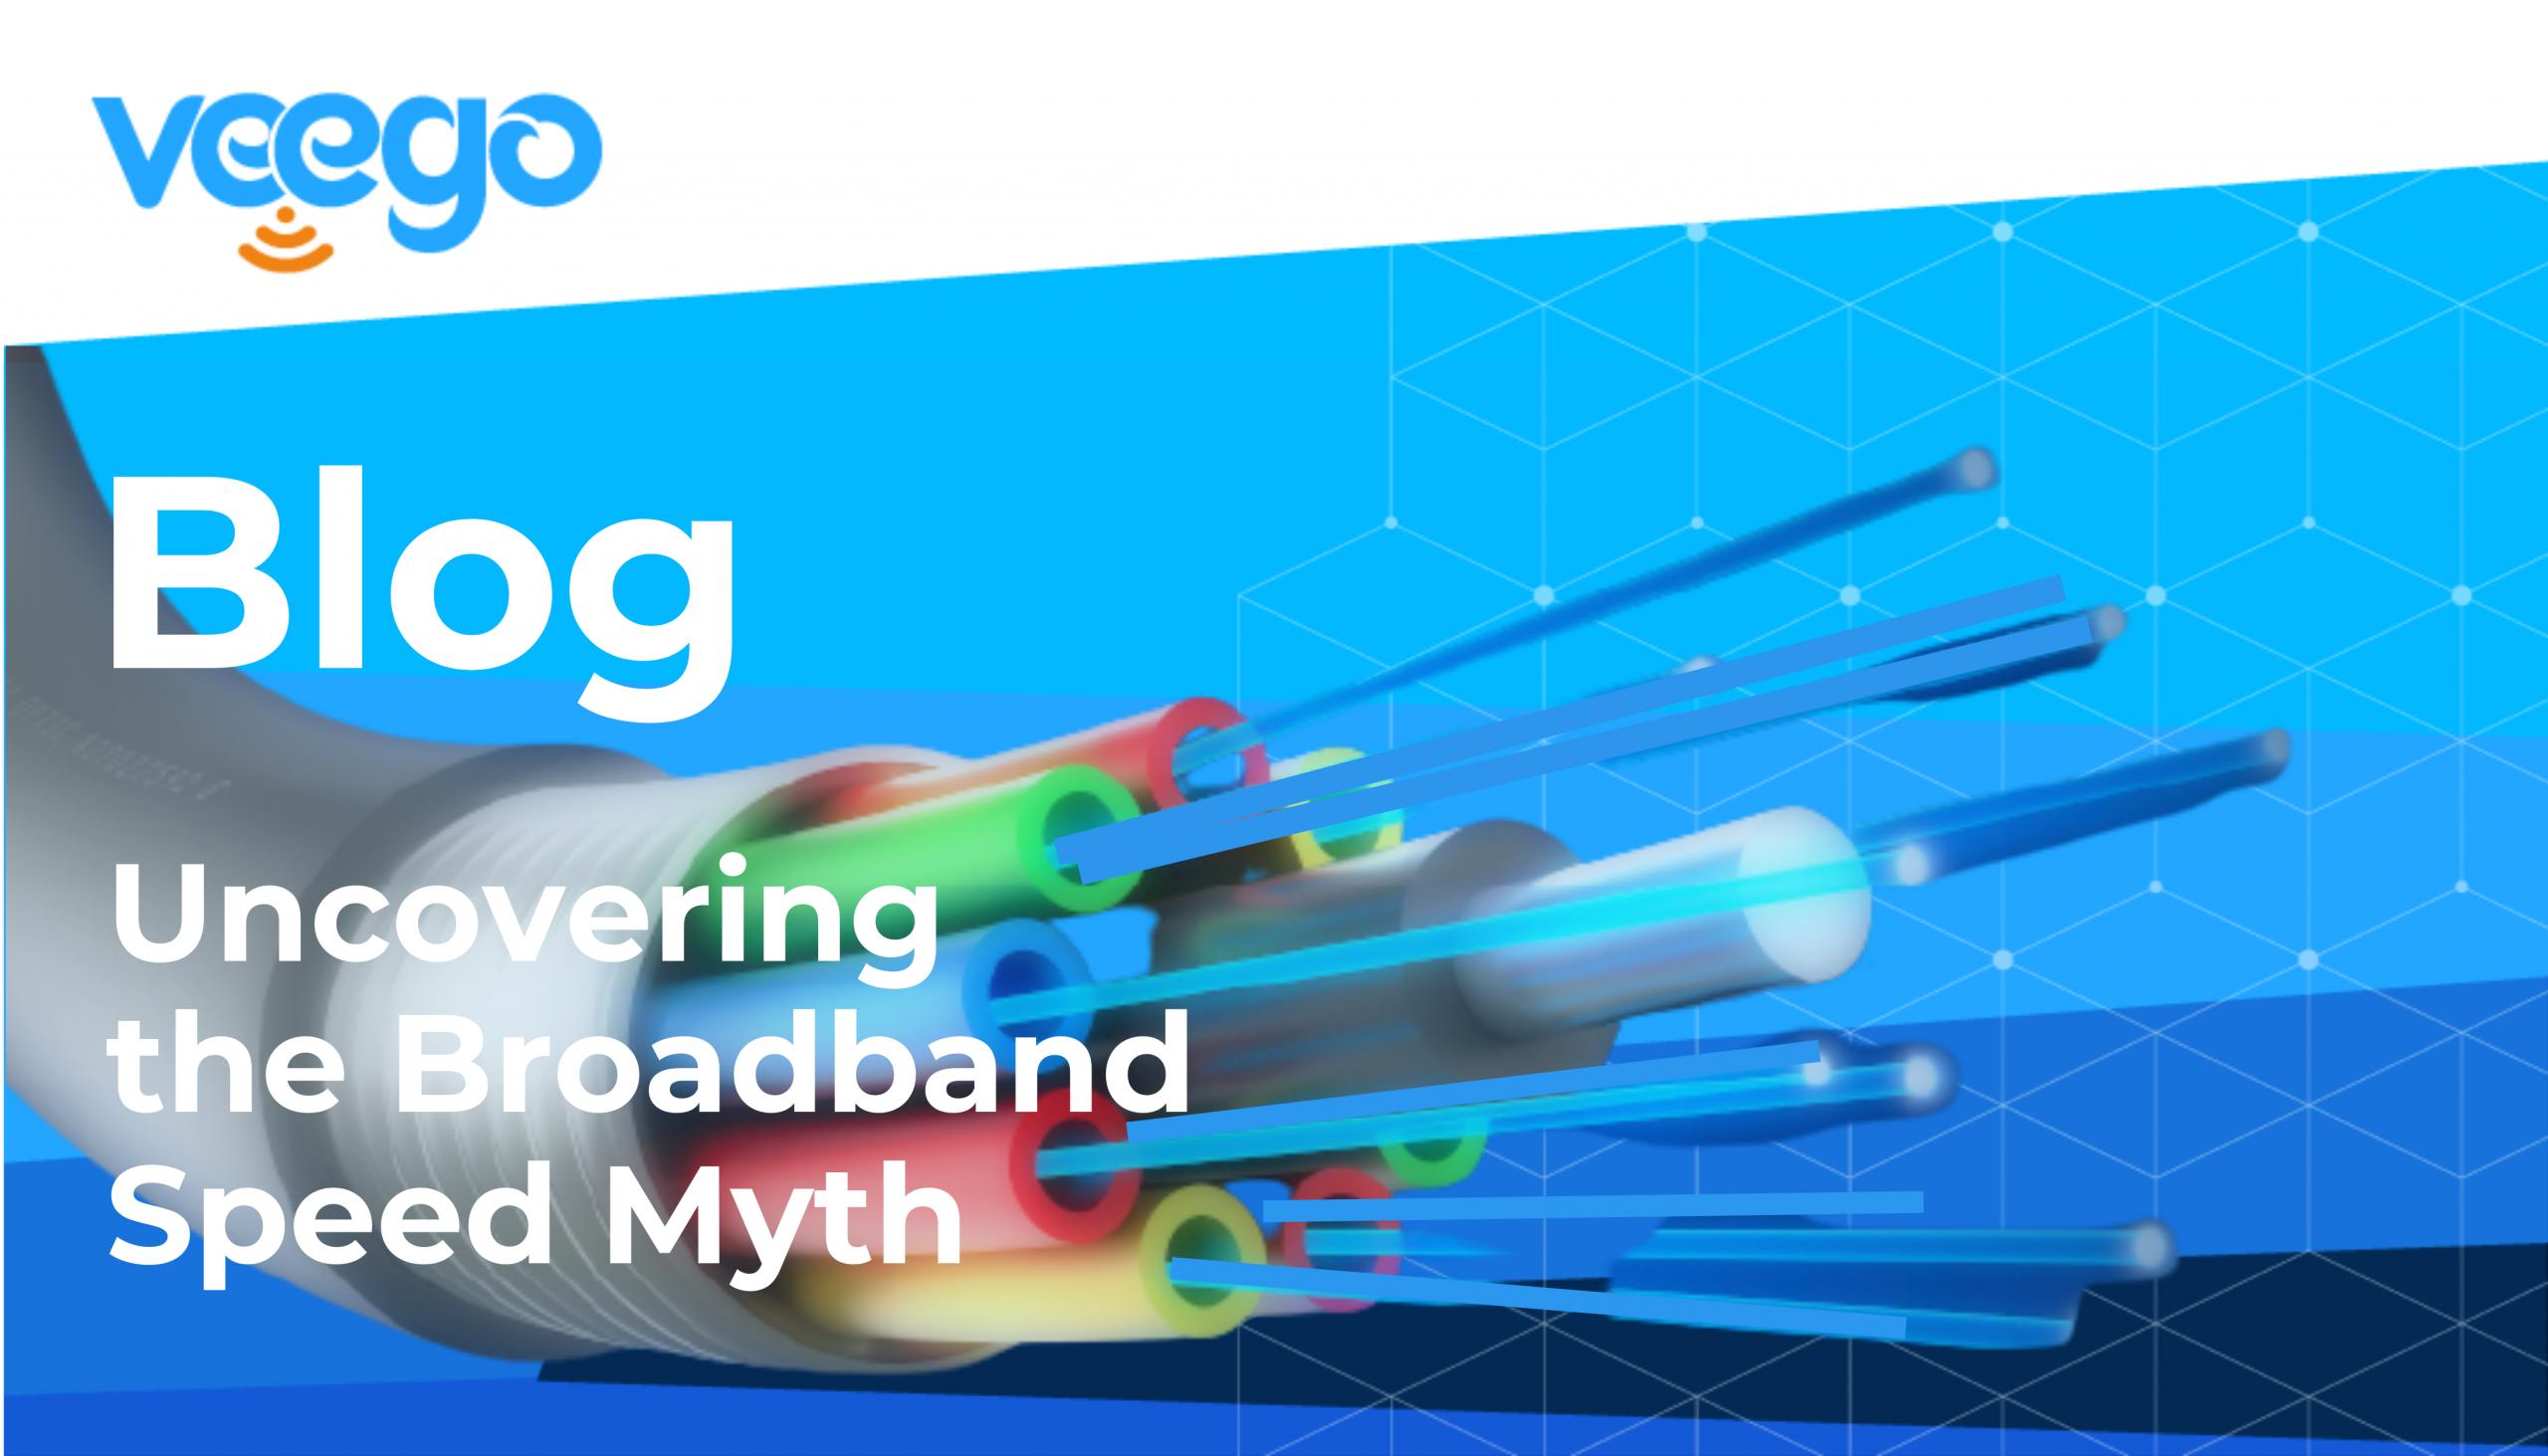 Broadband Speed Myth Blog